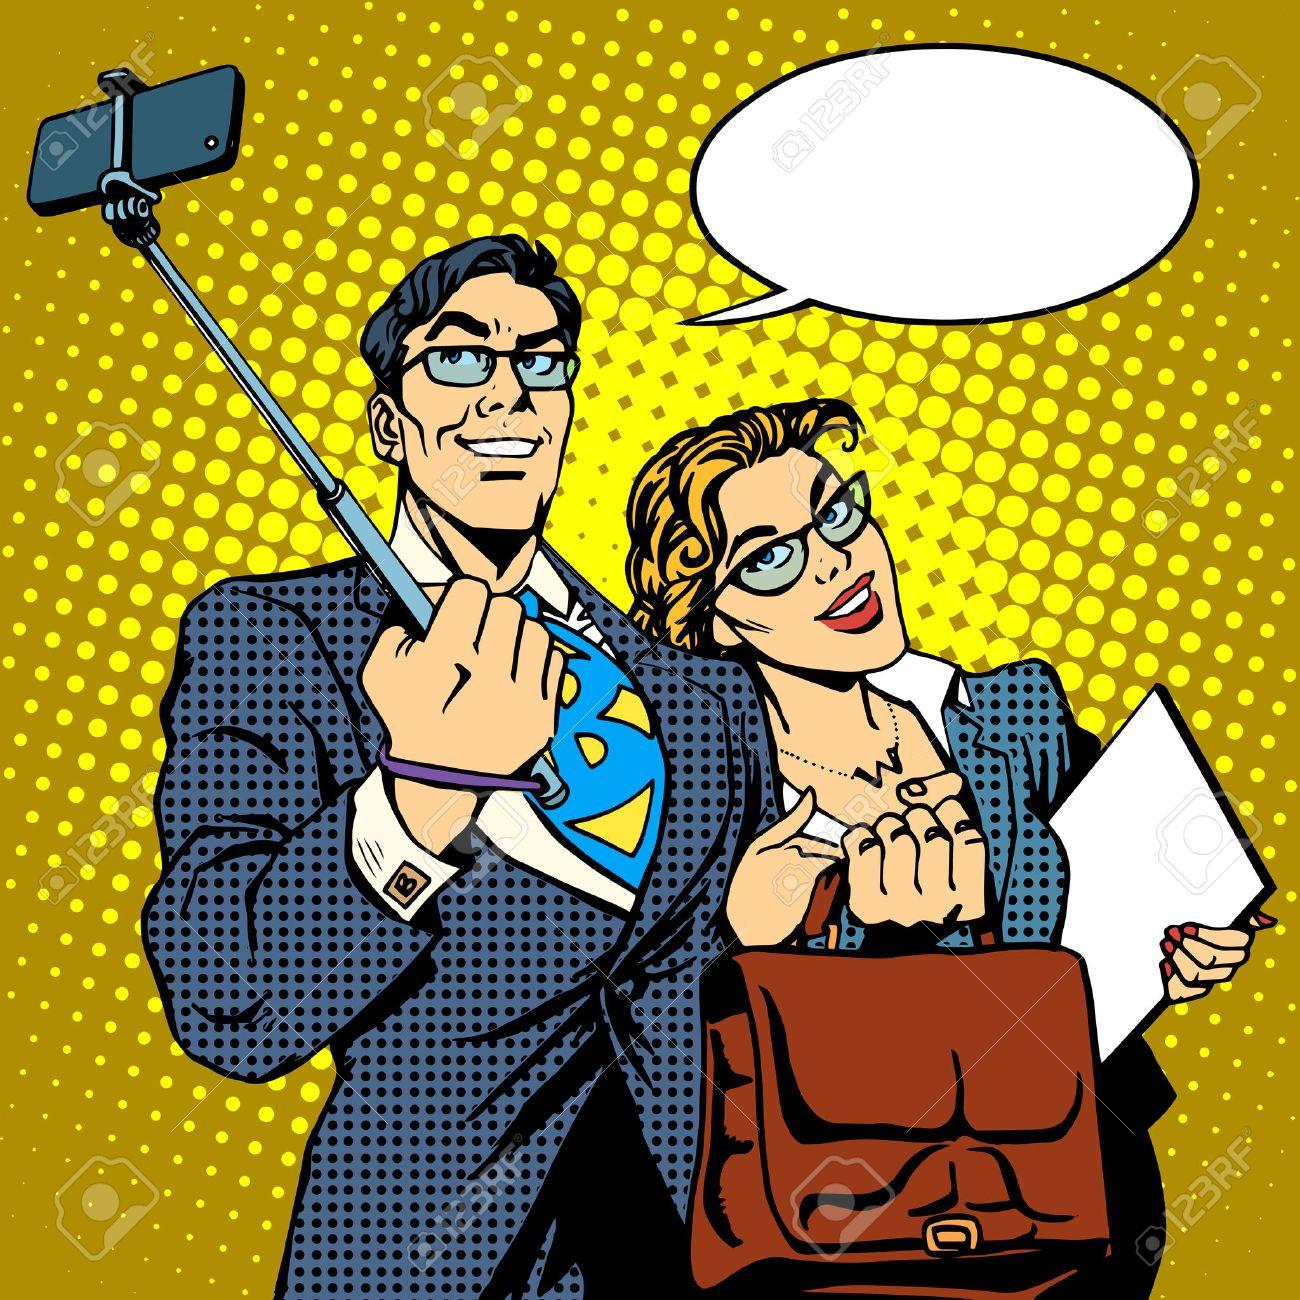 Selfie stick businessman and businesswoman photo smartphone pop art retro style. Couple man and woman friendly photo - 48085930